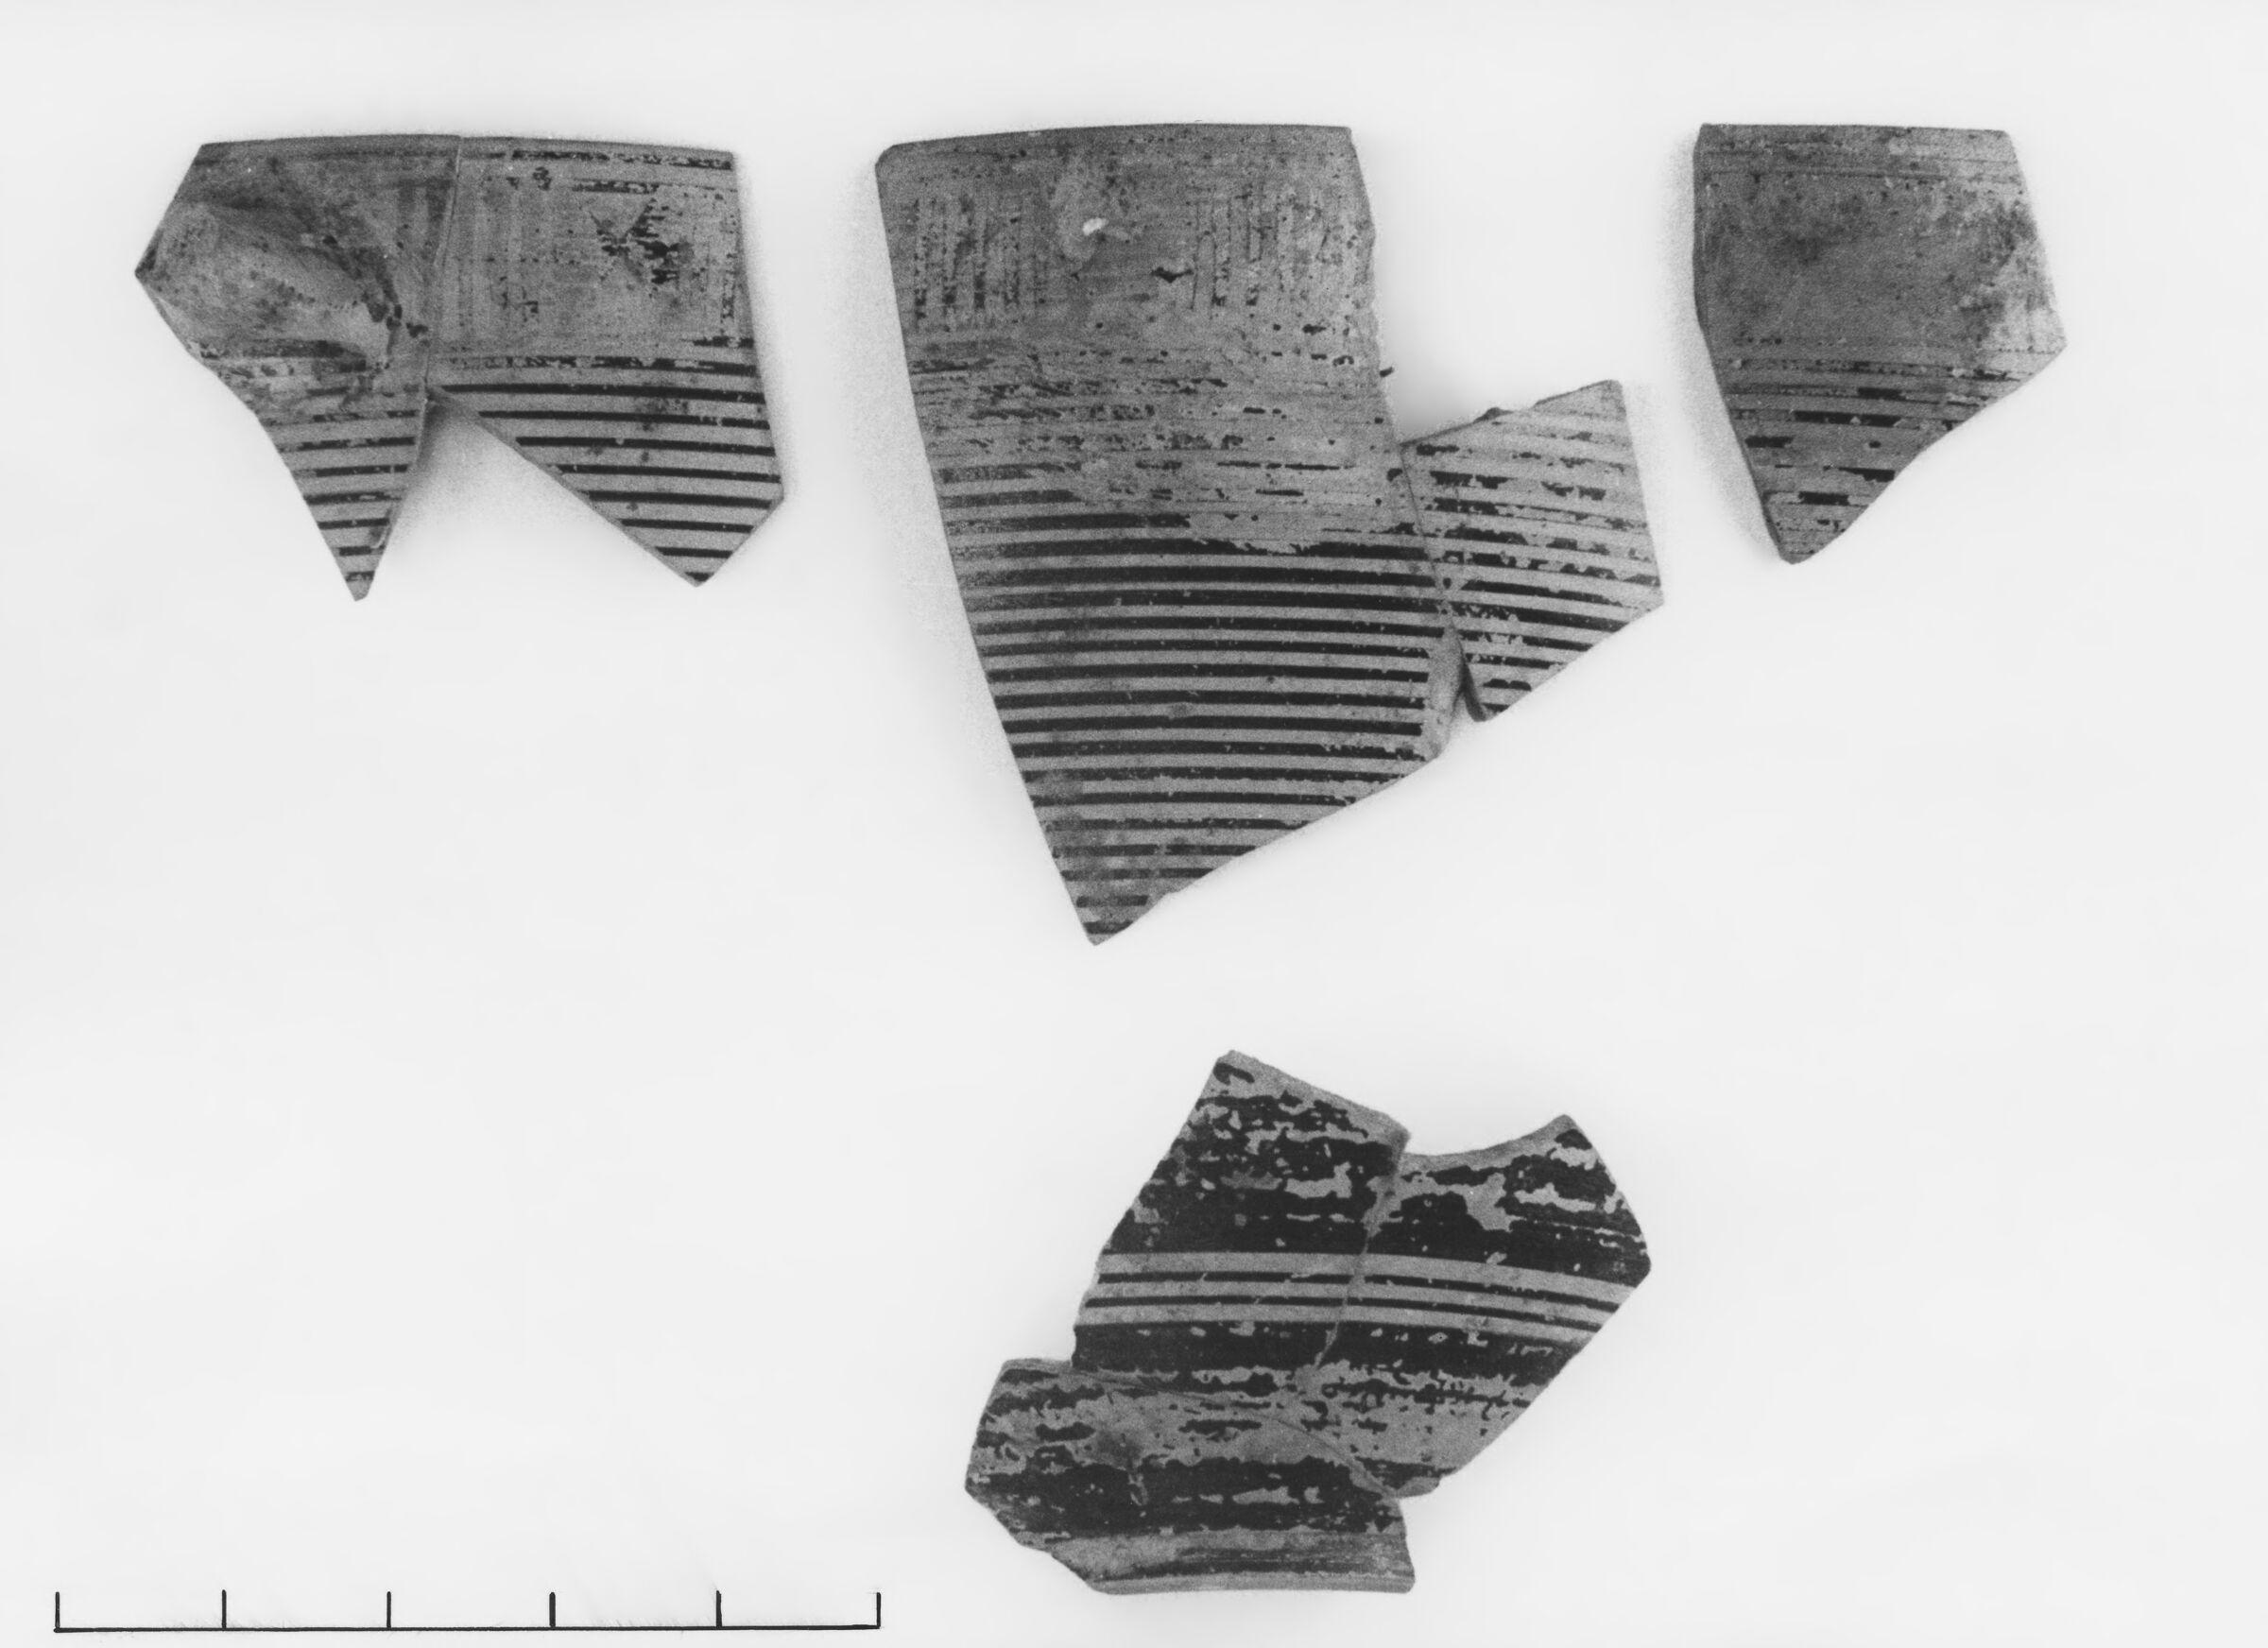 Early Protocorinthian Linear Kotyle Fragments